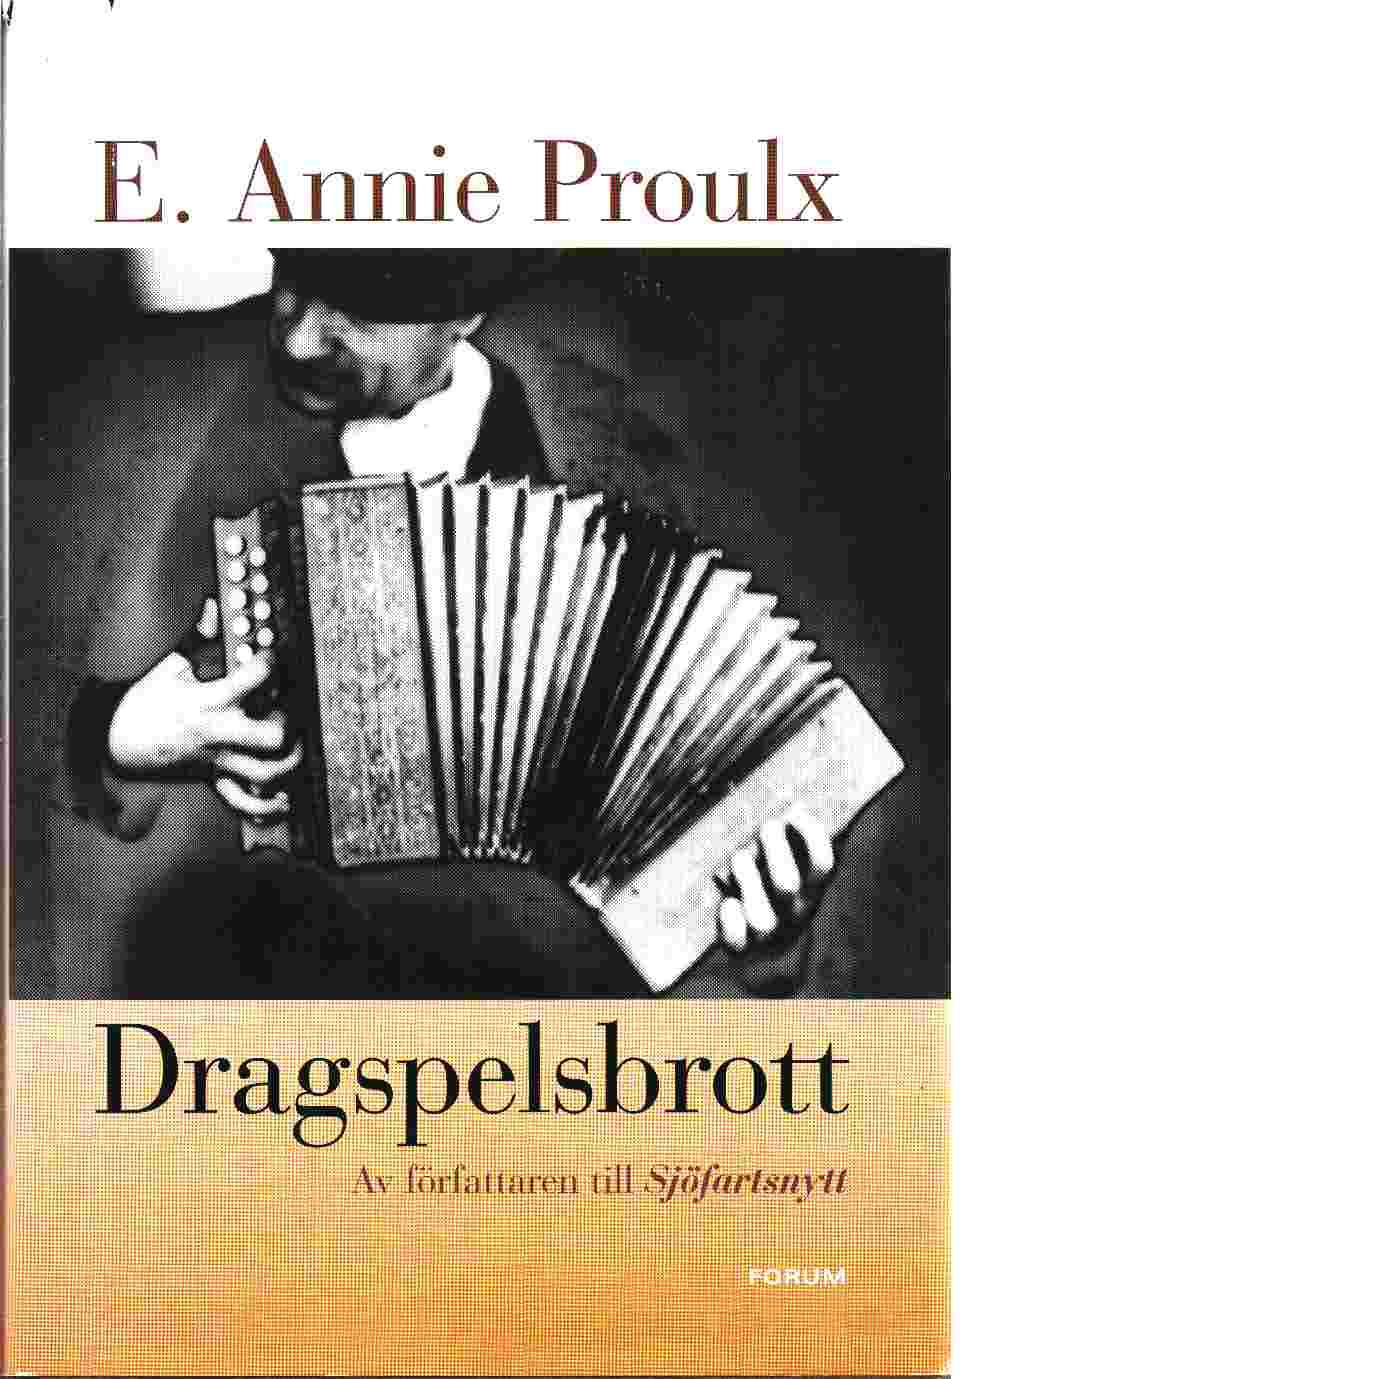 Dragspelsbrott - Proulx, Annie